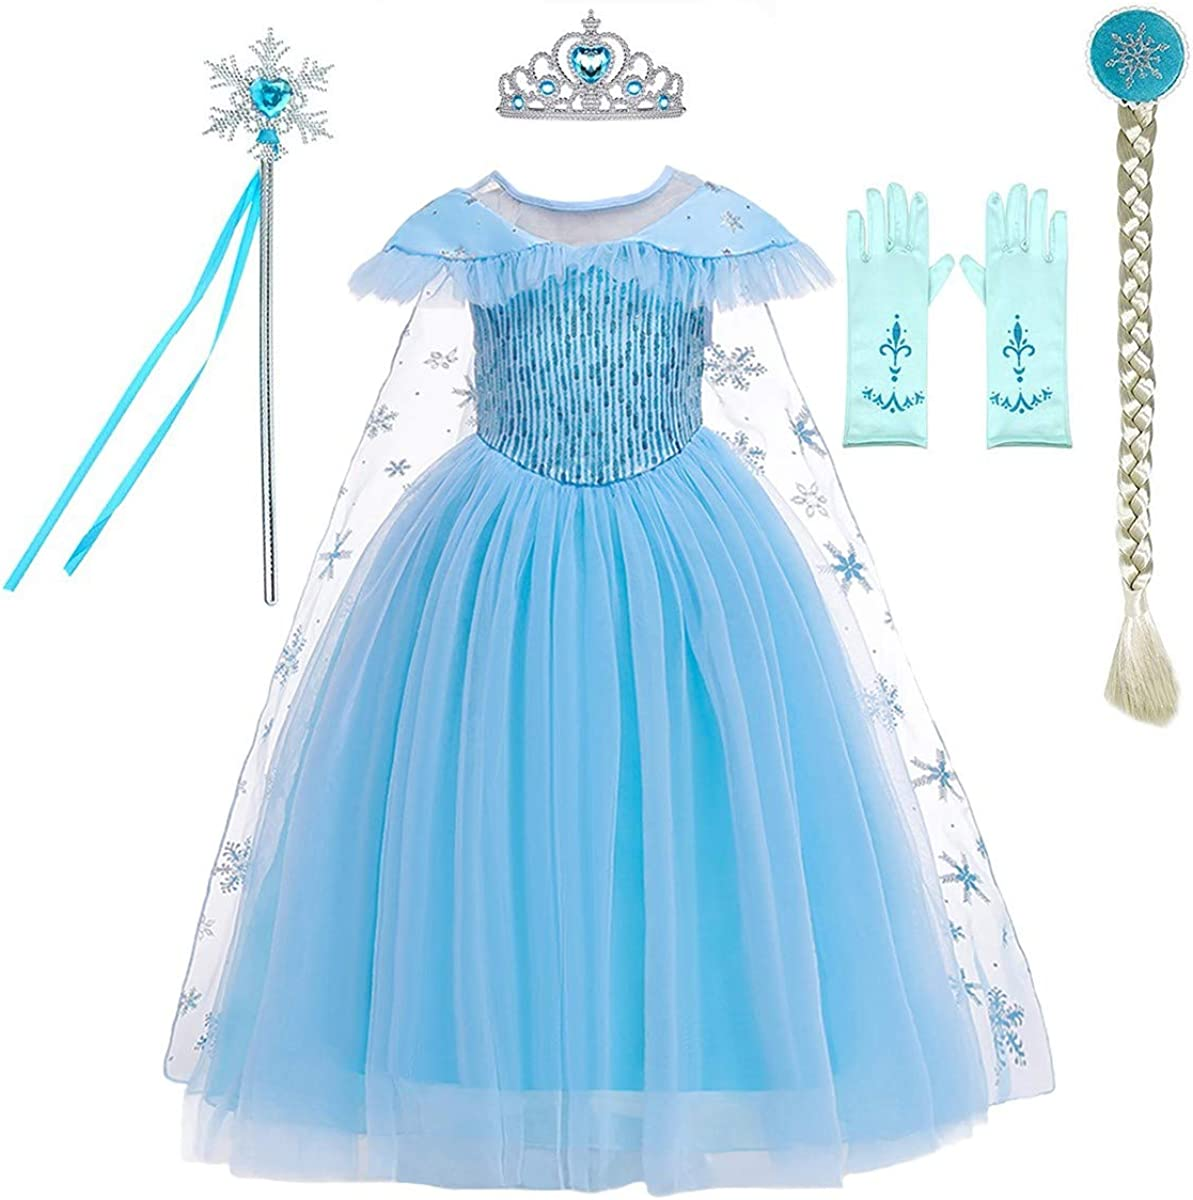 Kids Girls Costume Elsa Princess Fancy Dress Up Cosplay Party Christmas gift